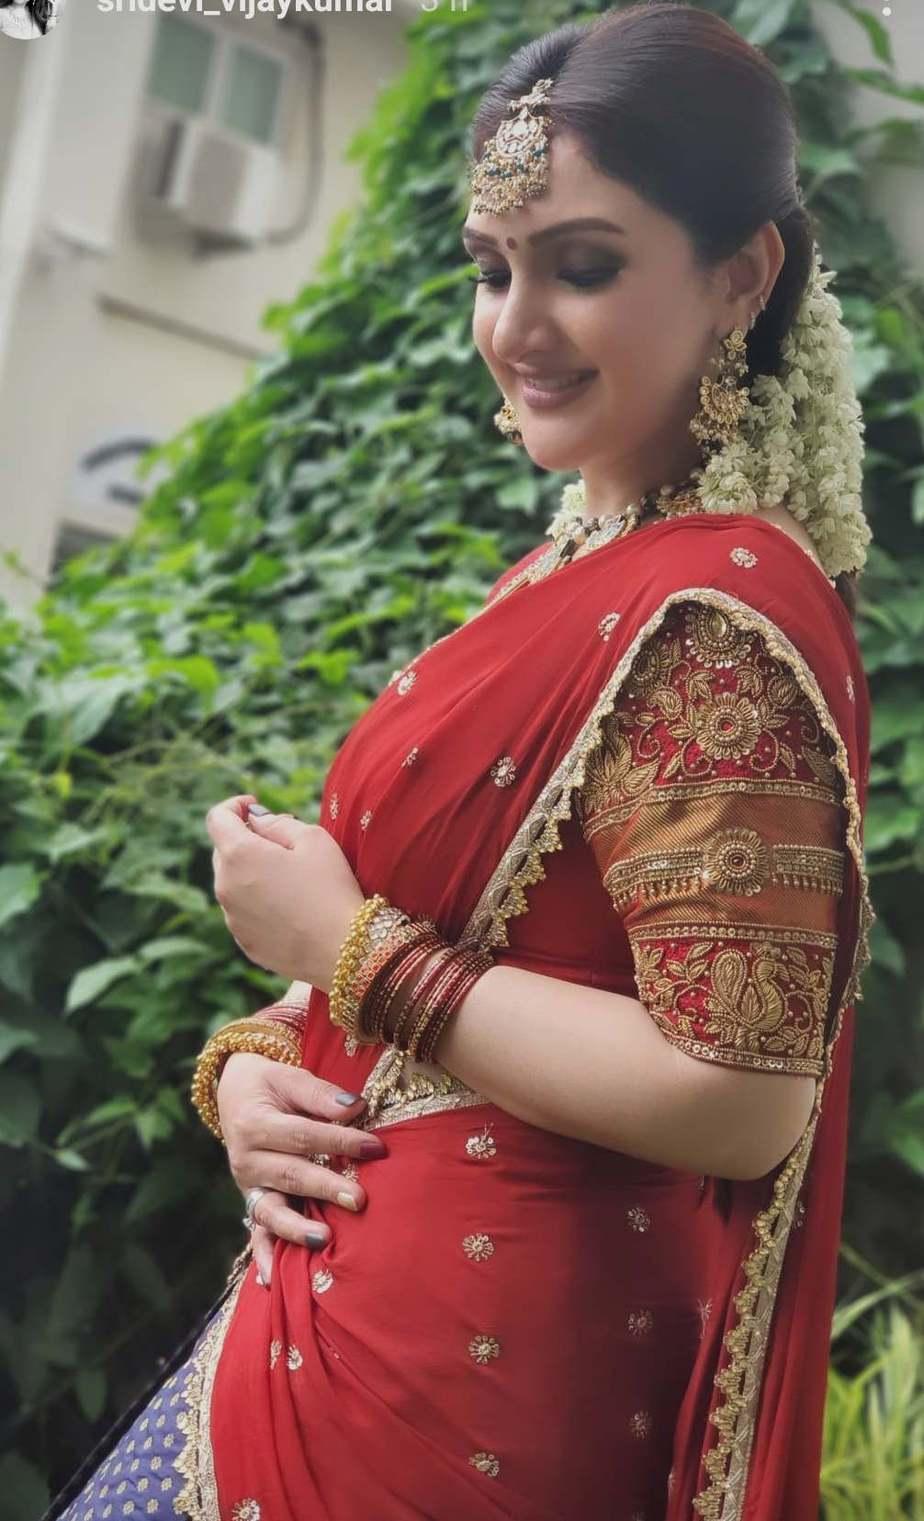 Sridevi vijaykumar in kowshiki couture half saree for comedy stars-4